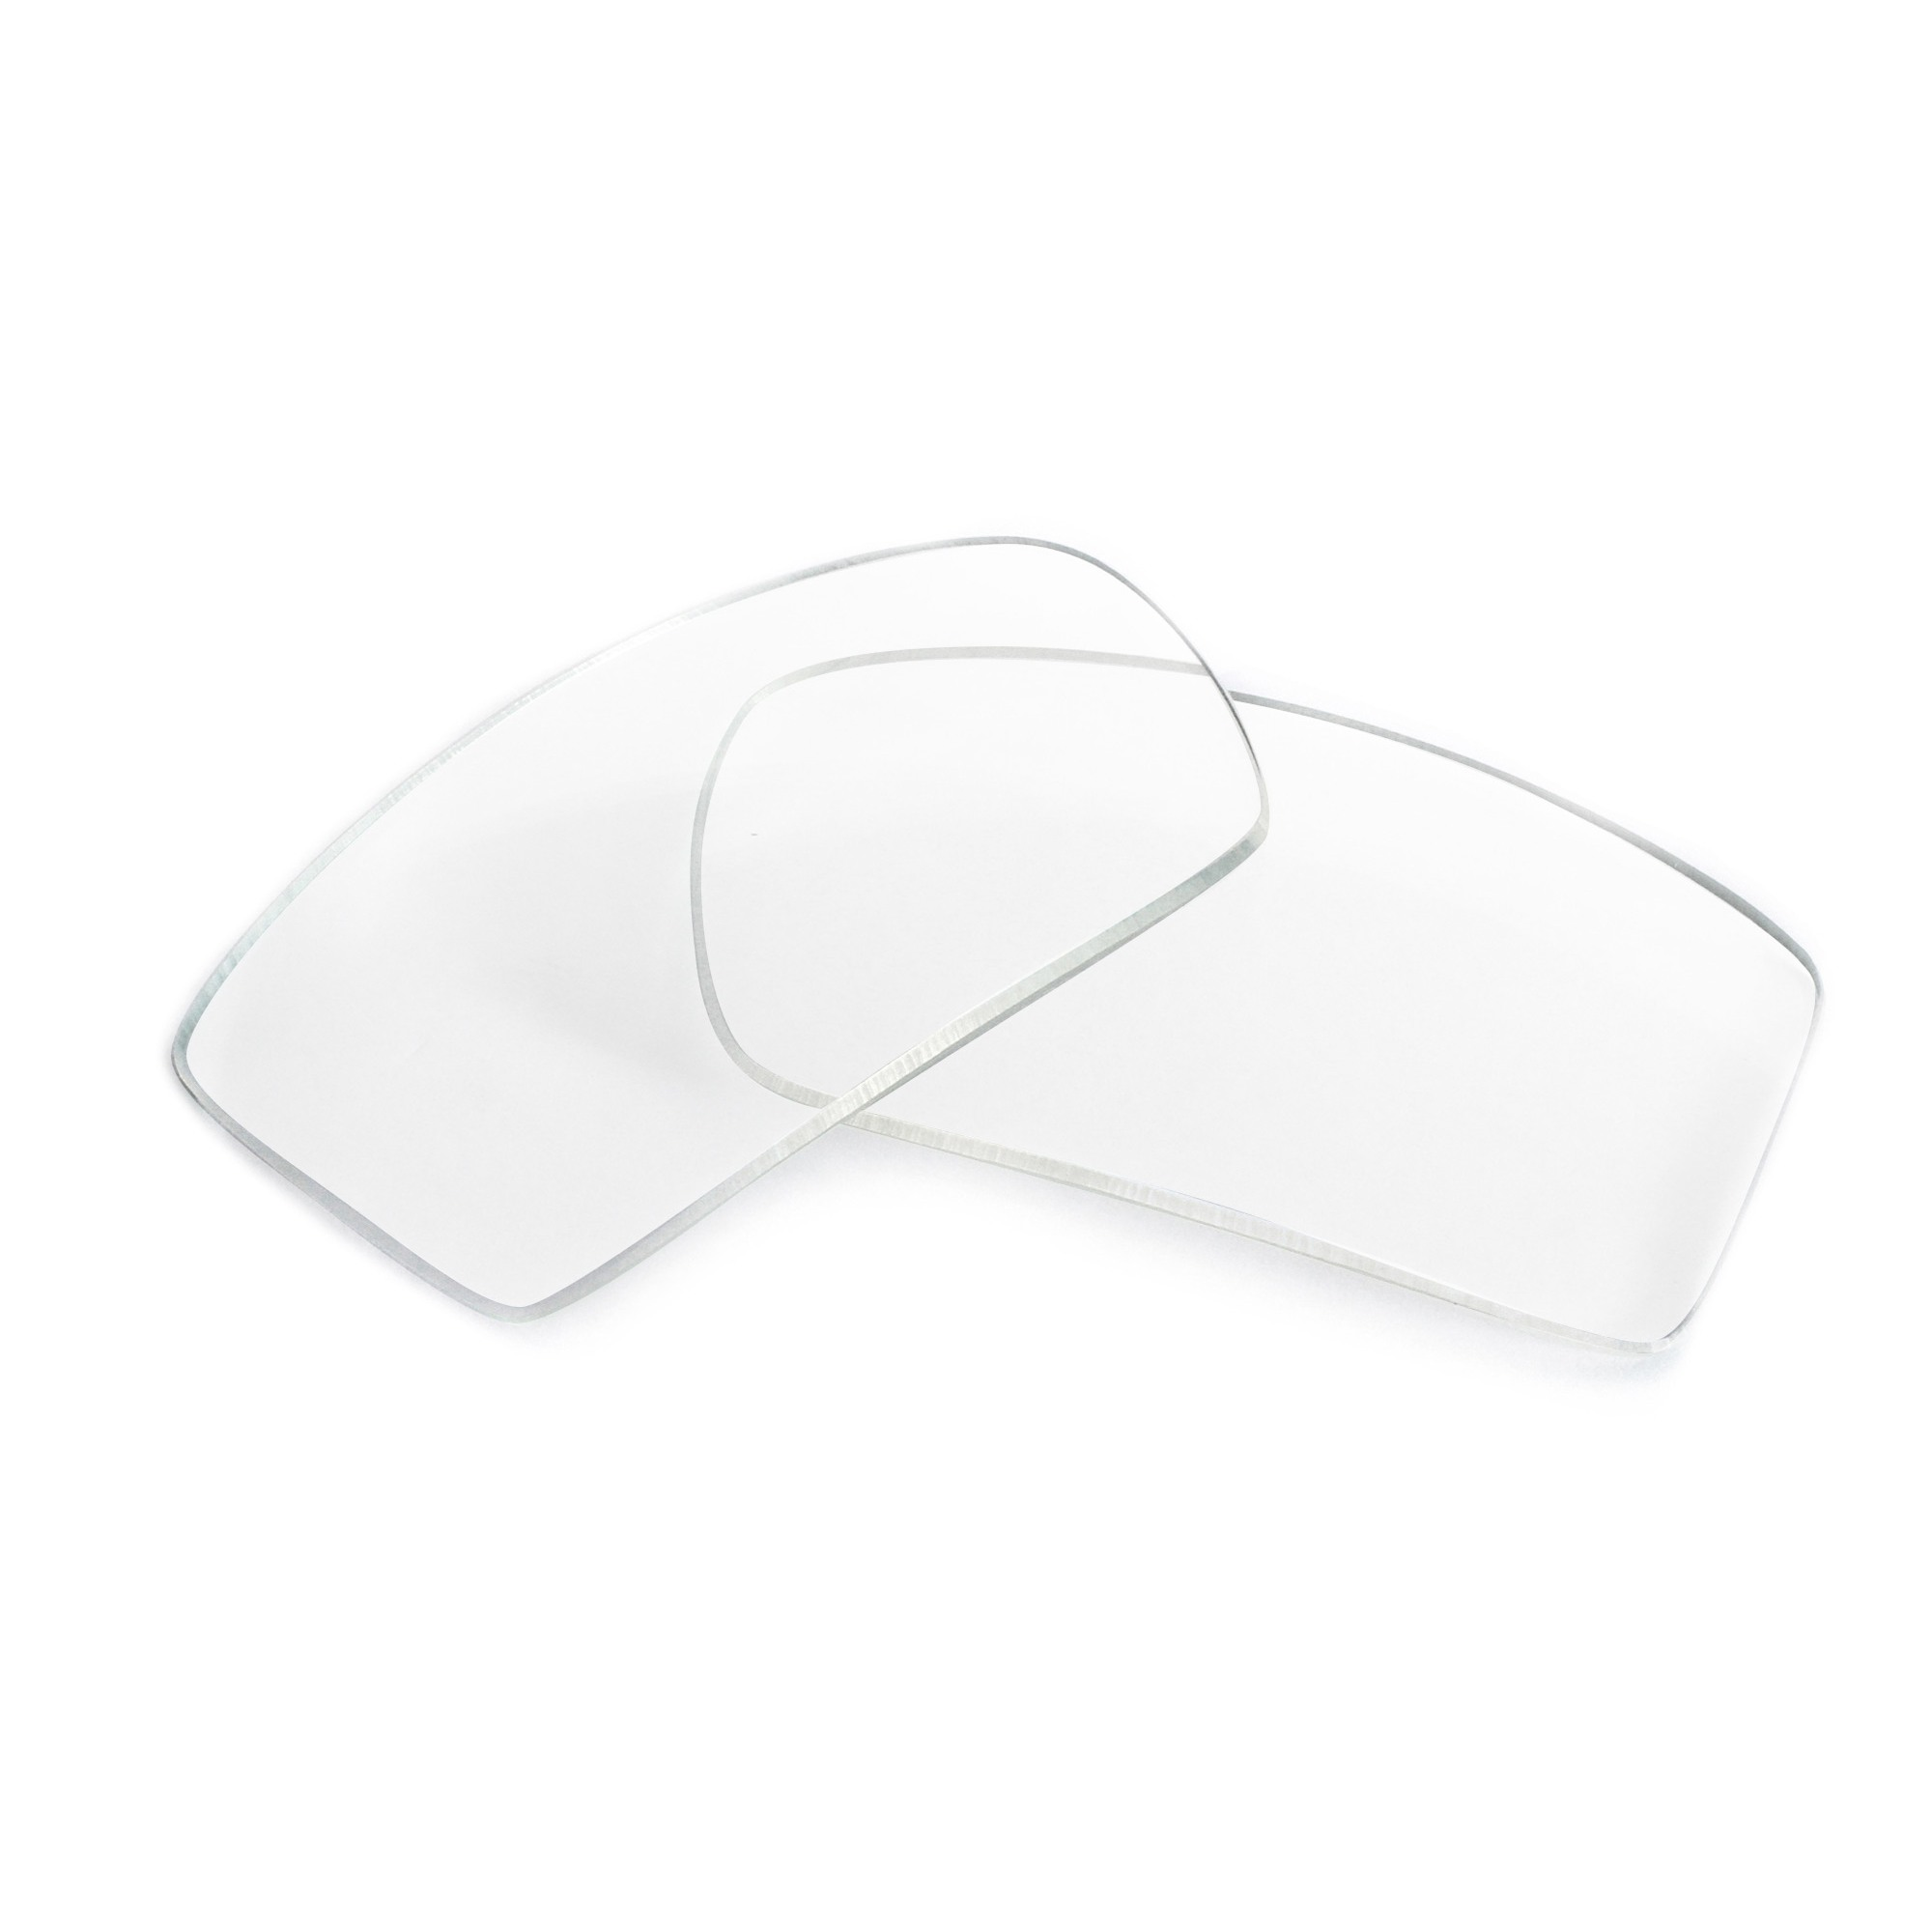 Fuse Lenses Non Polarized Replacement Lenses For Maui Jim